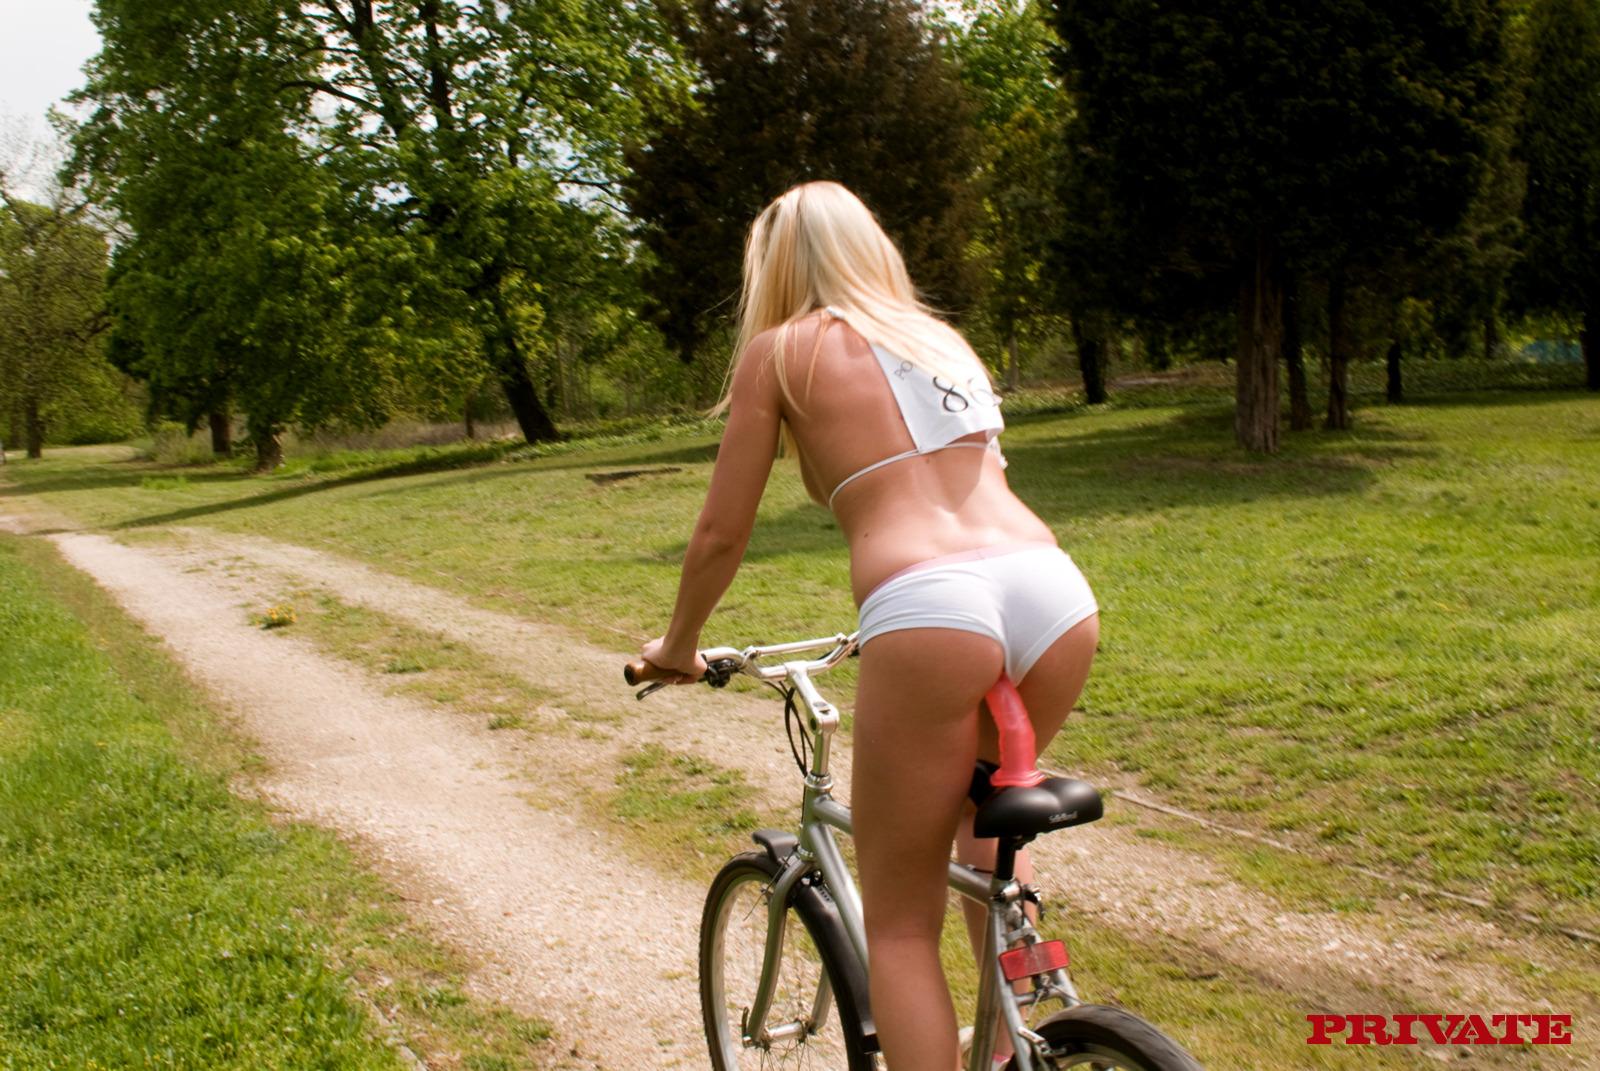 Bike with a dildo